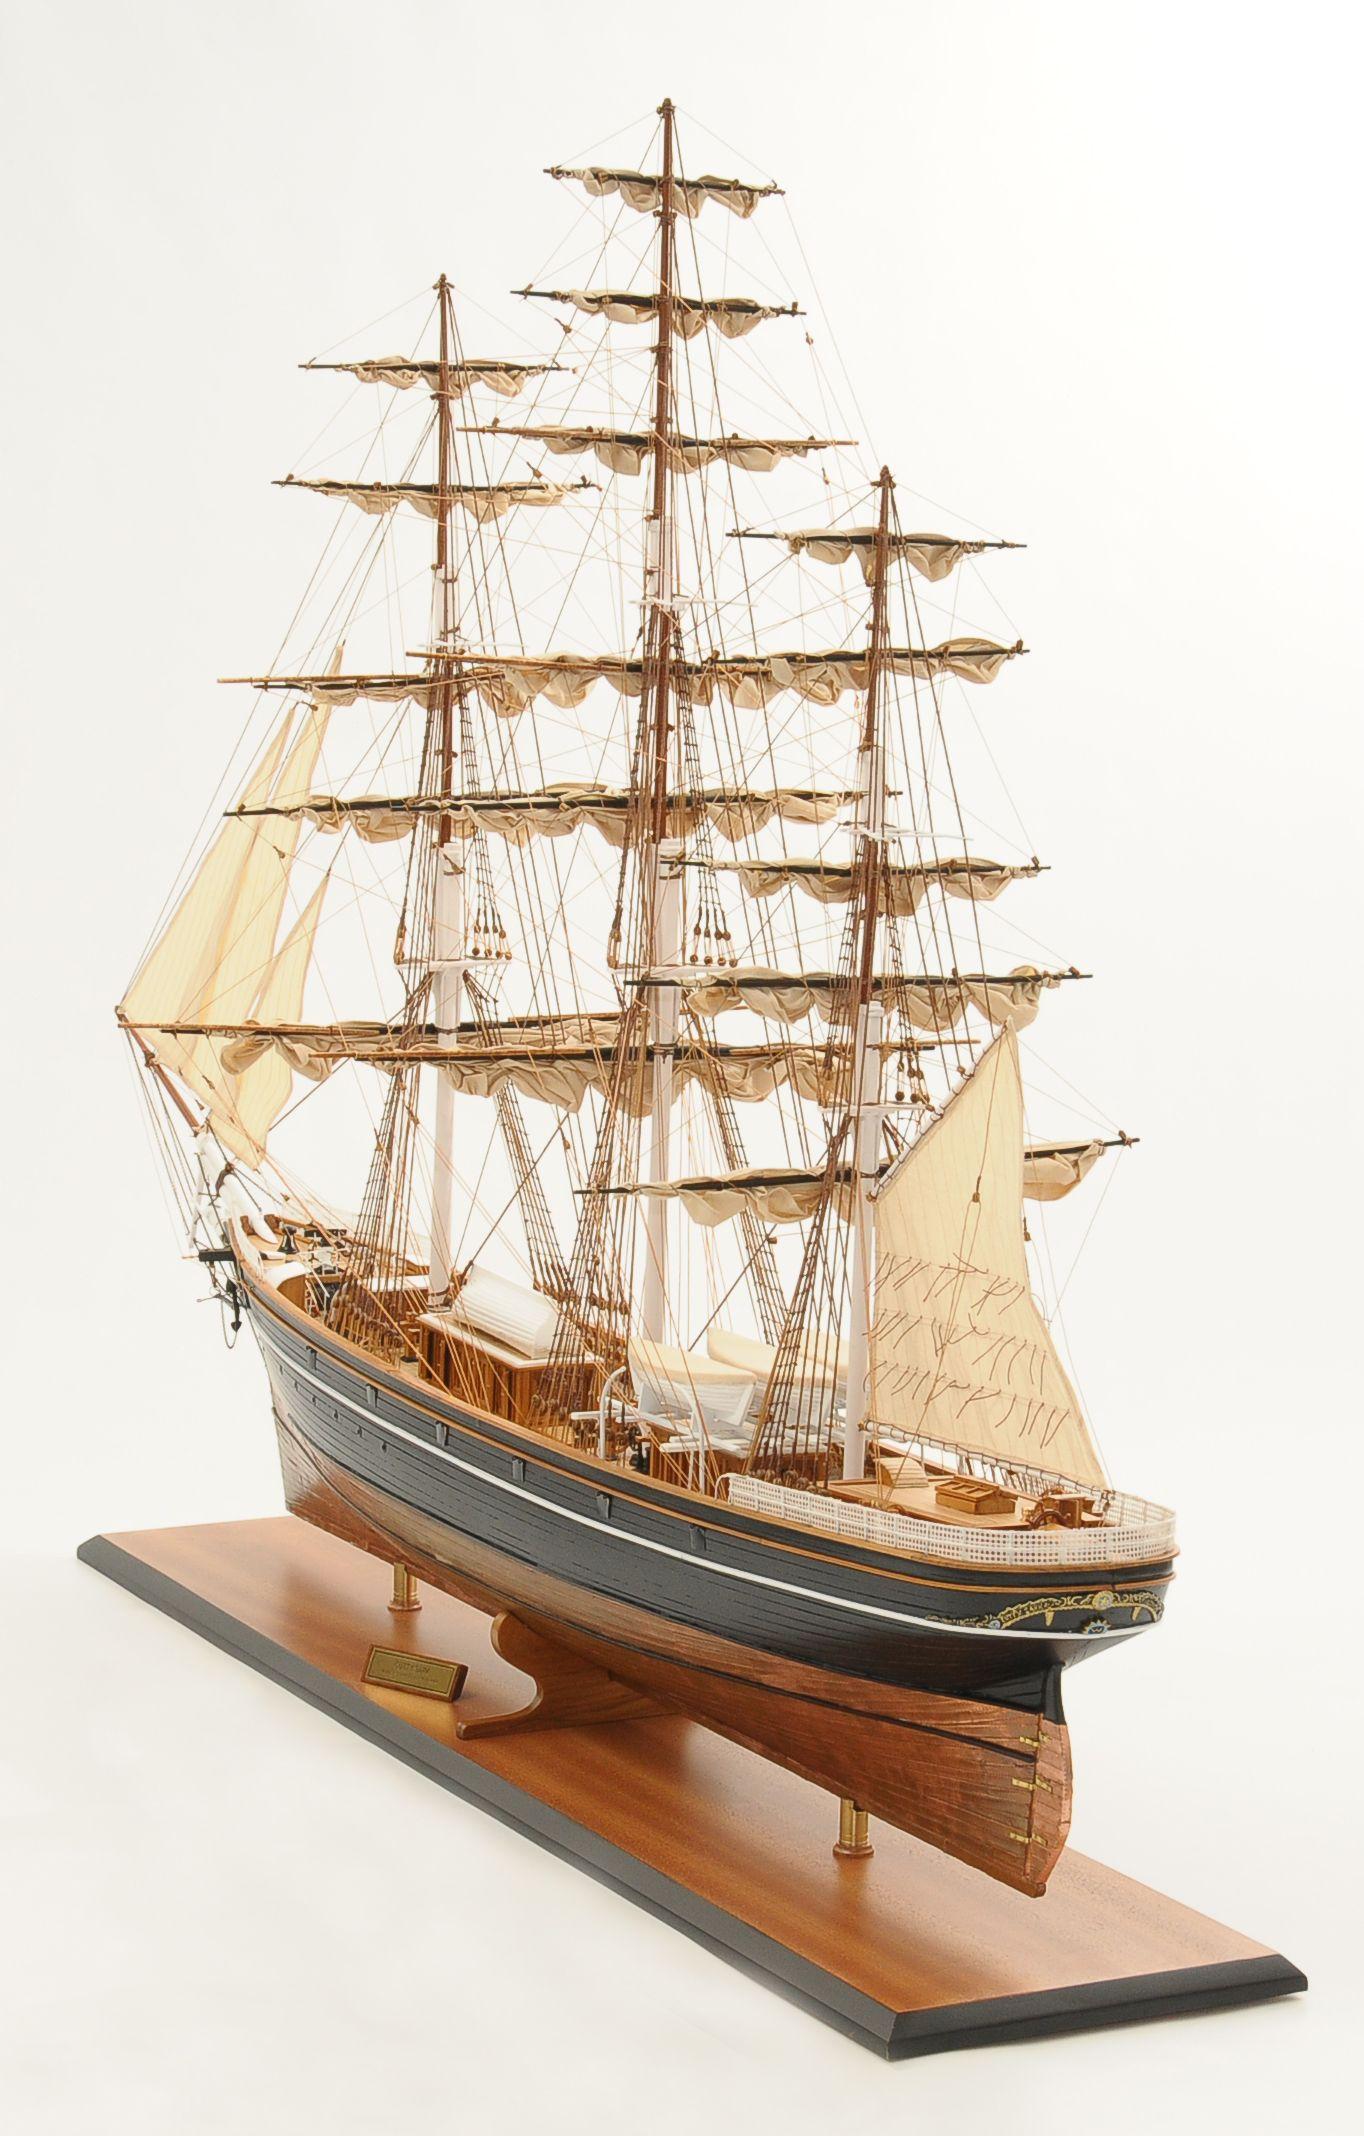 553-8664-Cutty-Sark-model-ship-Premier-Range